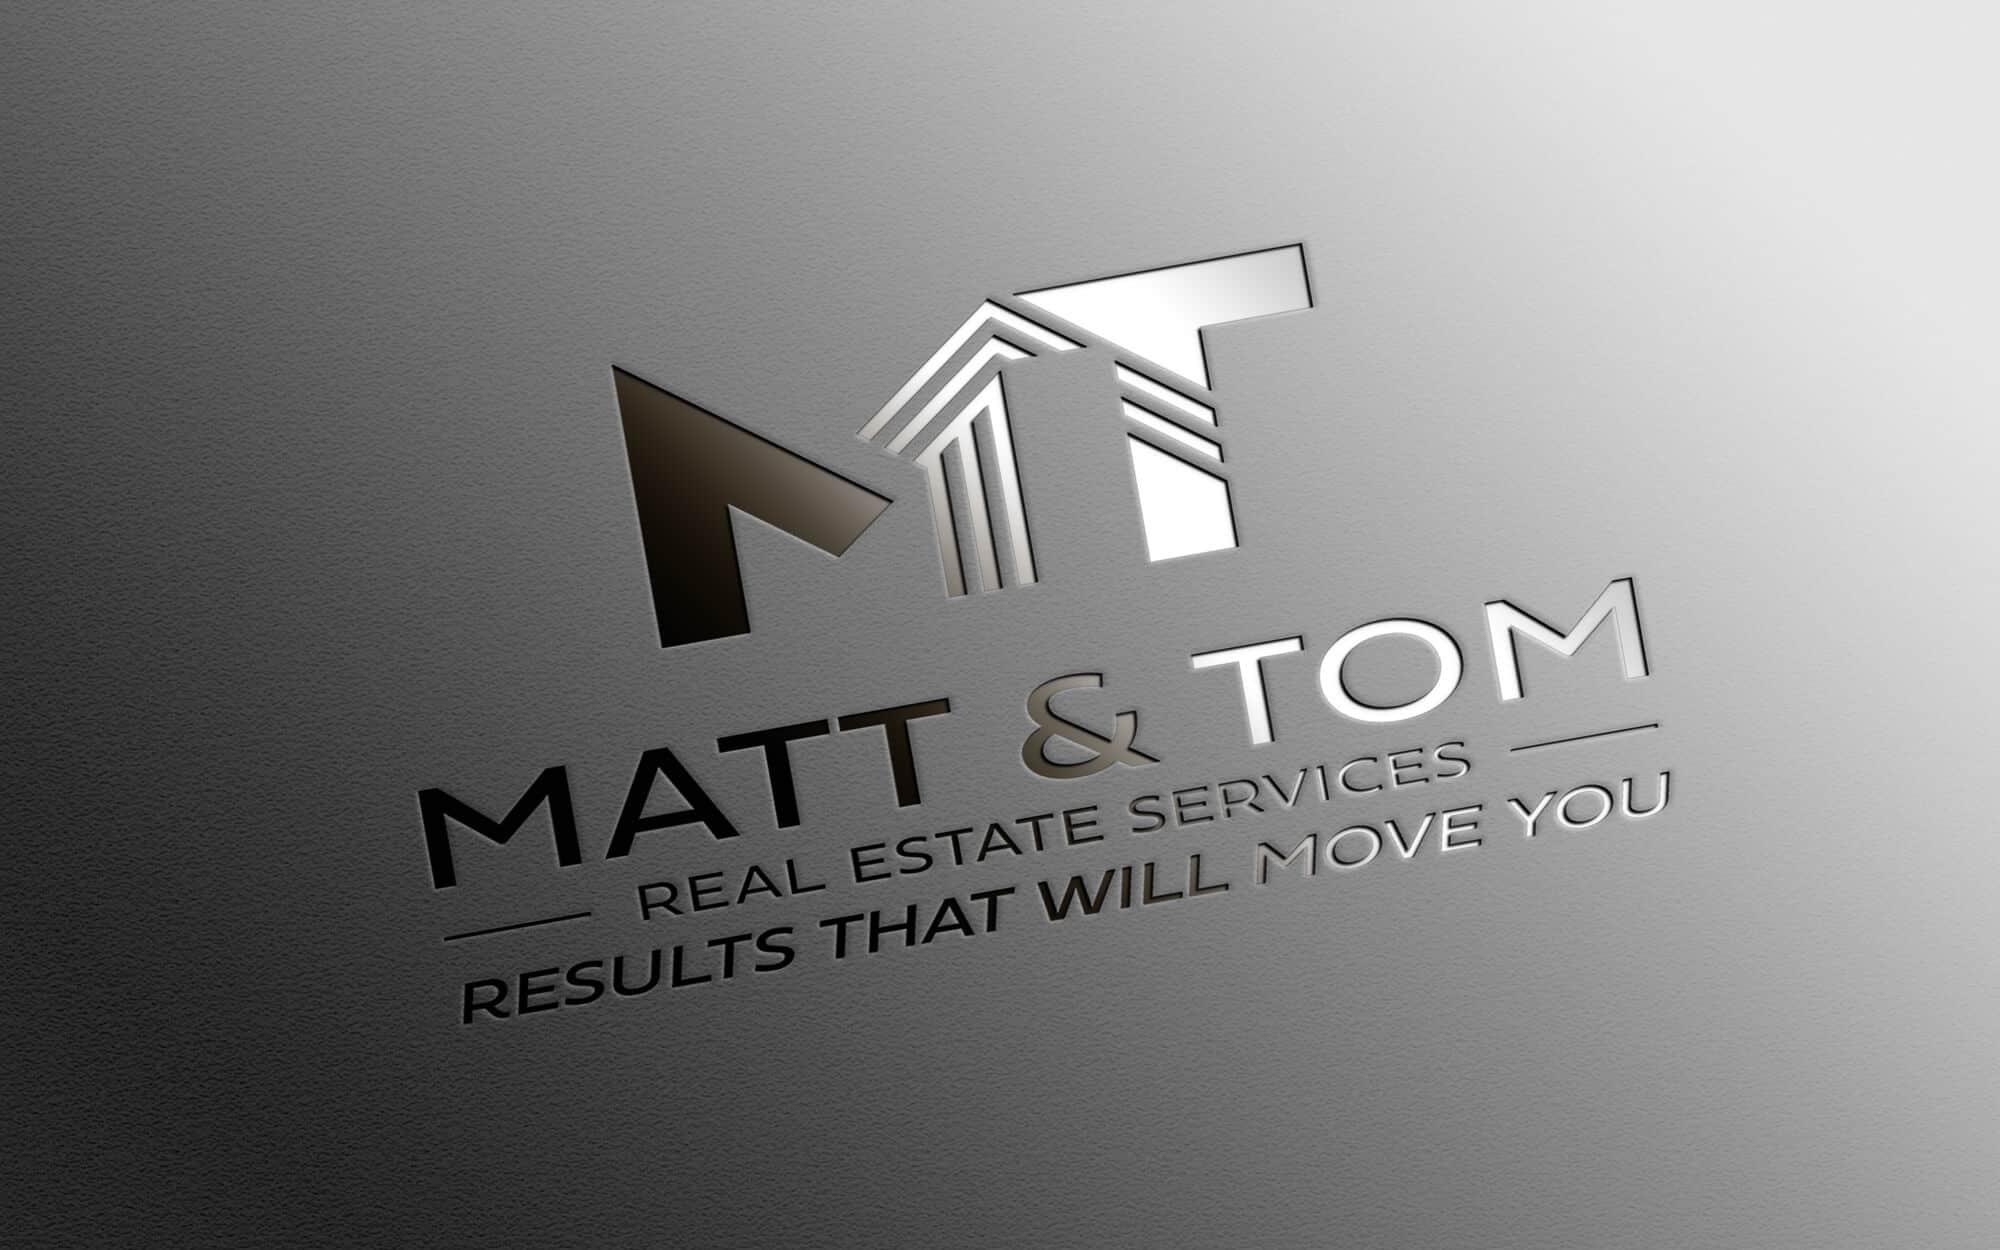 Logo Design for Realtors & Real estate agents - Matt & Tom ...